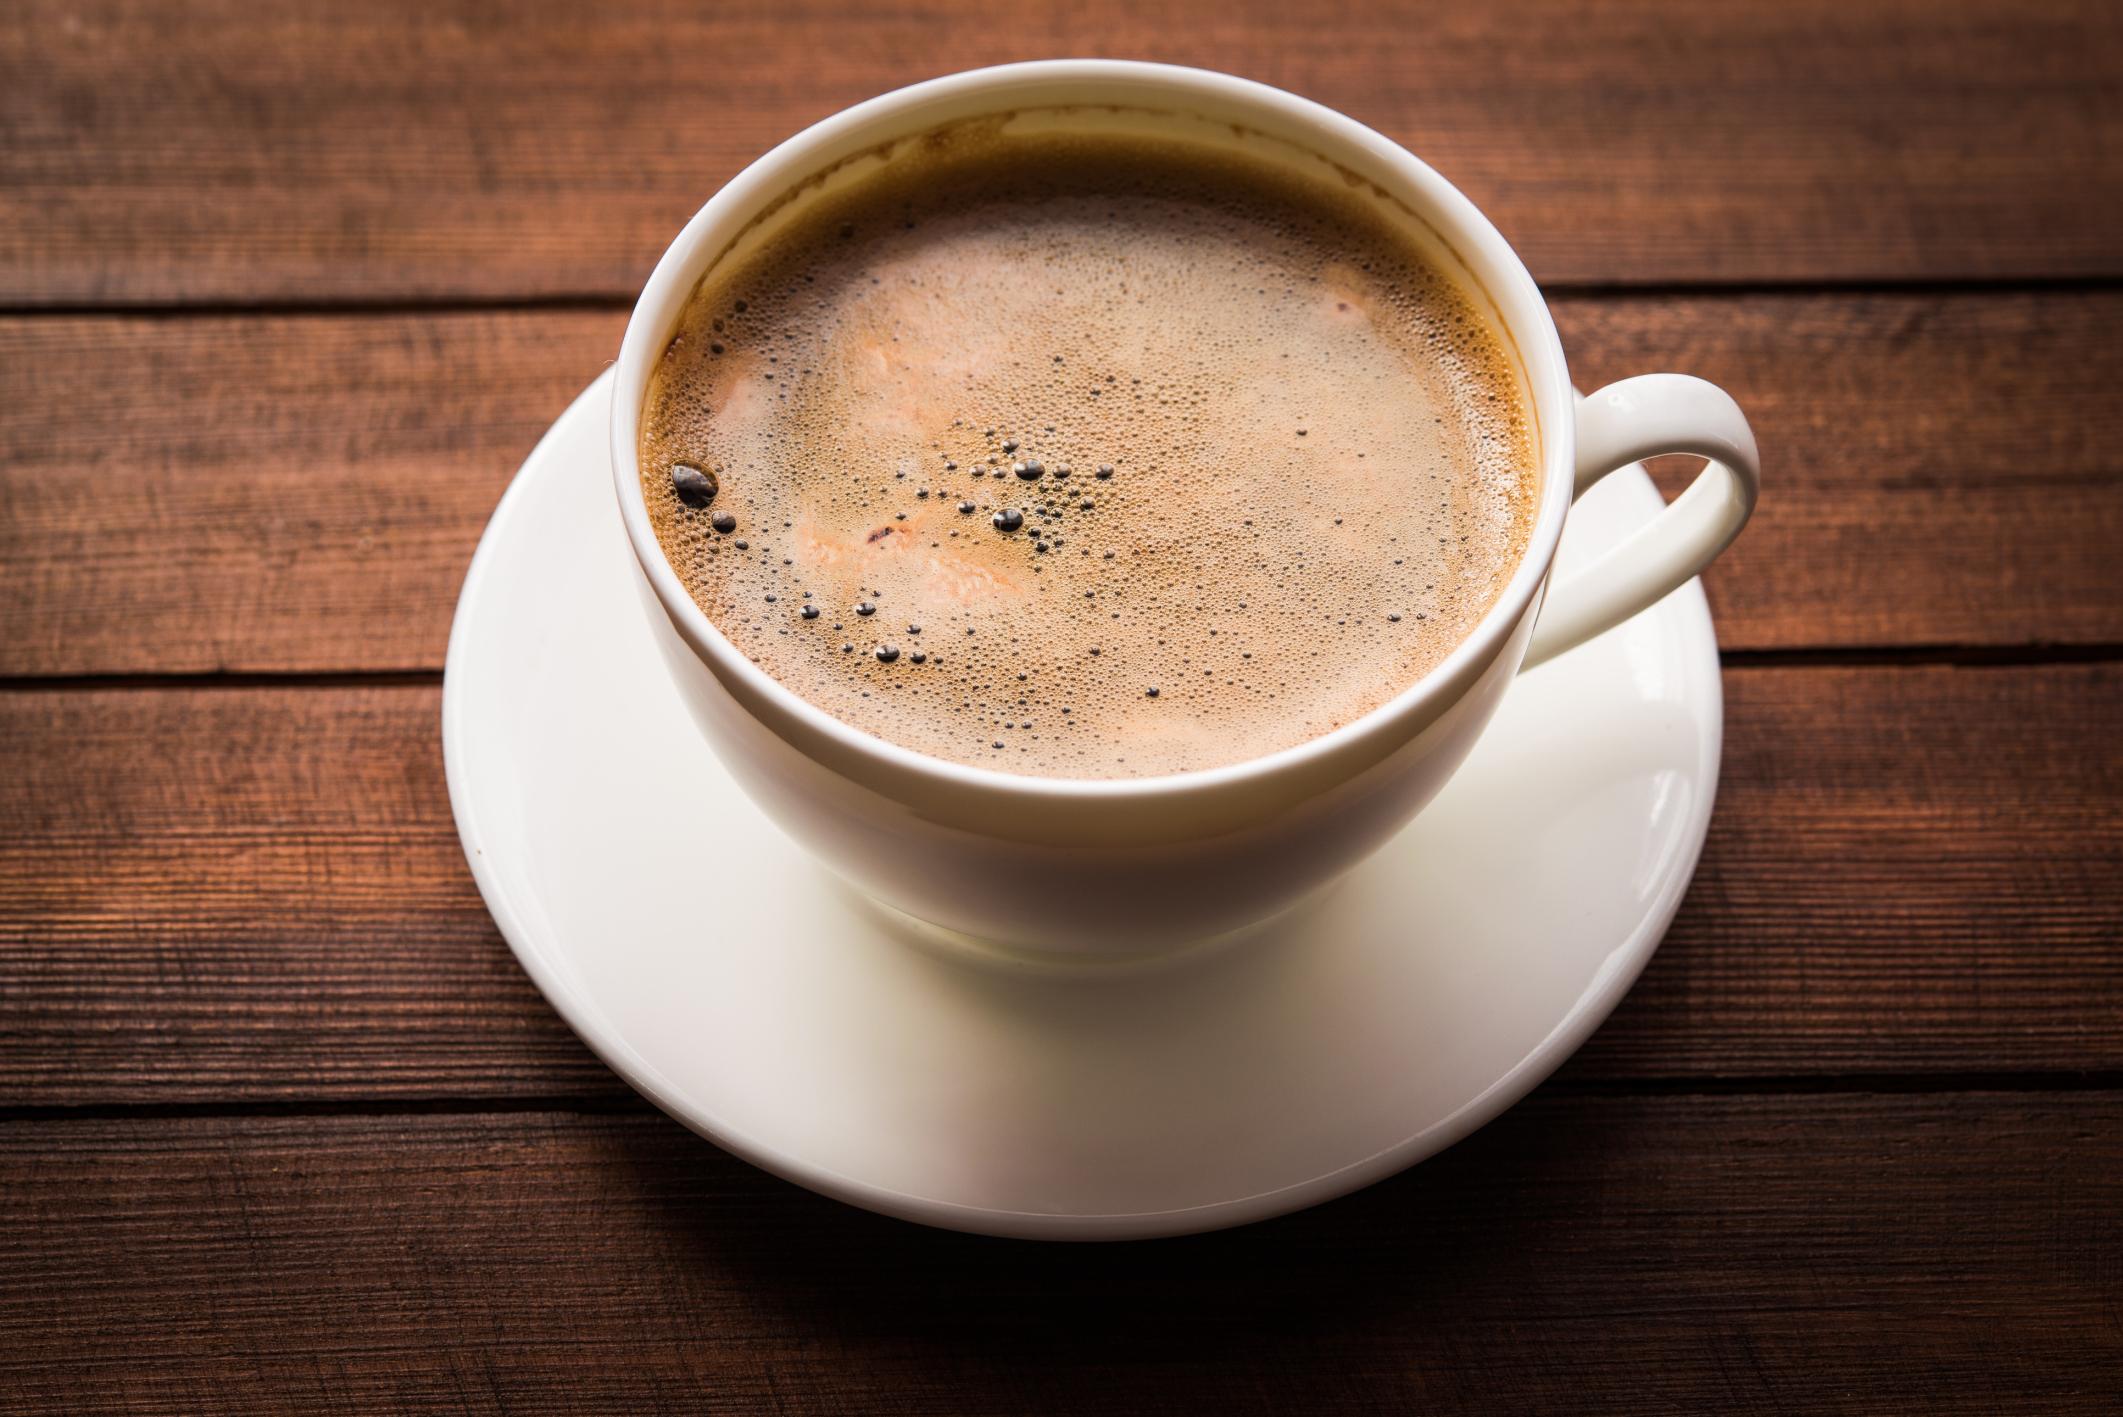 Wellbutrin and caffeine